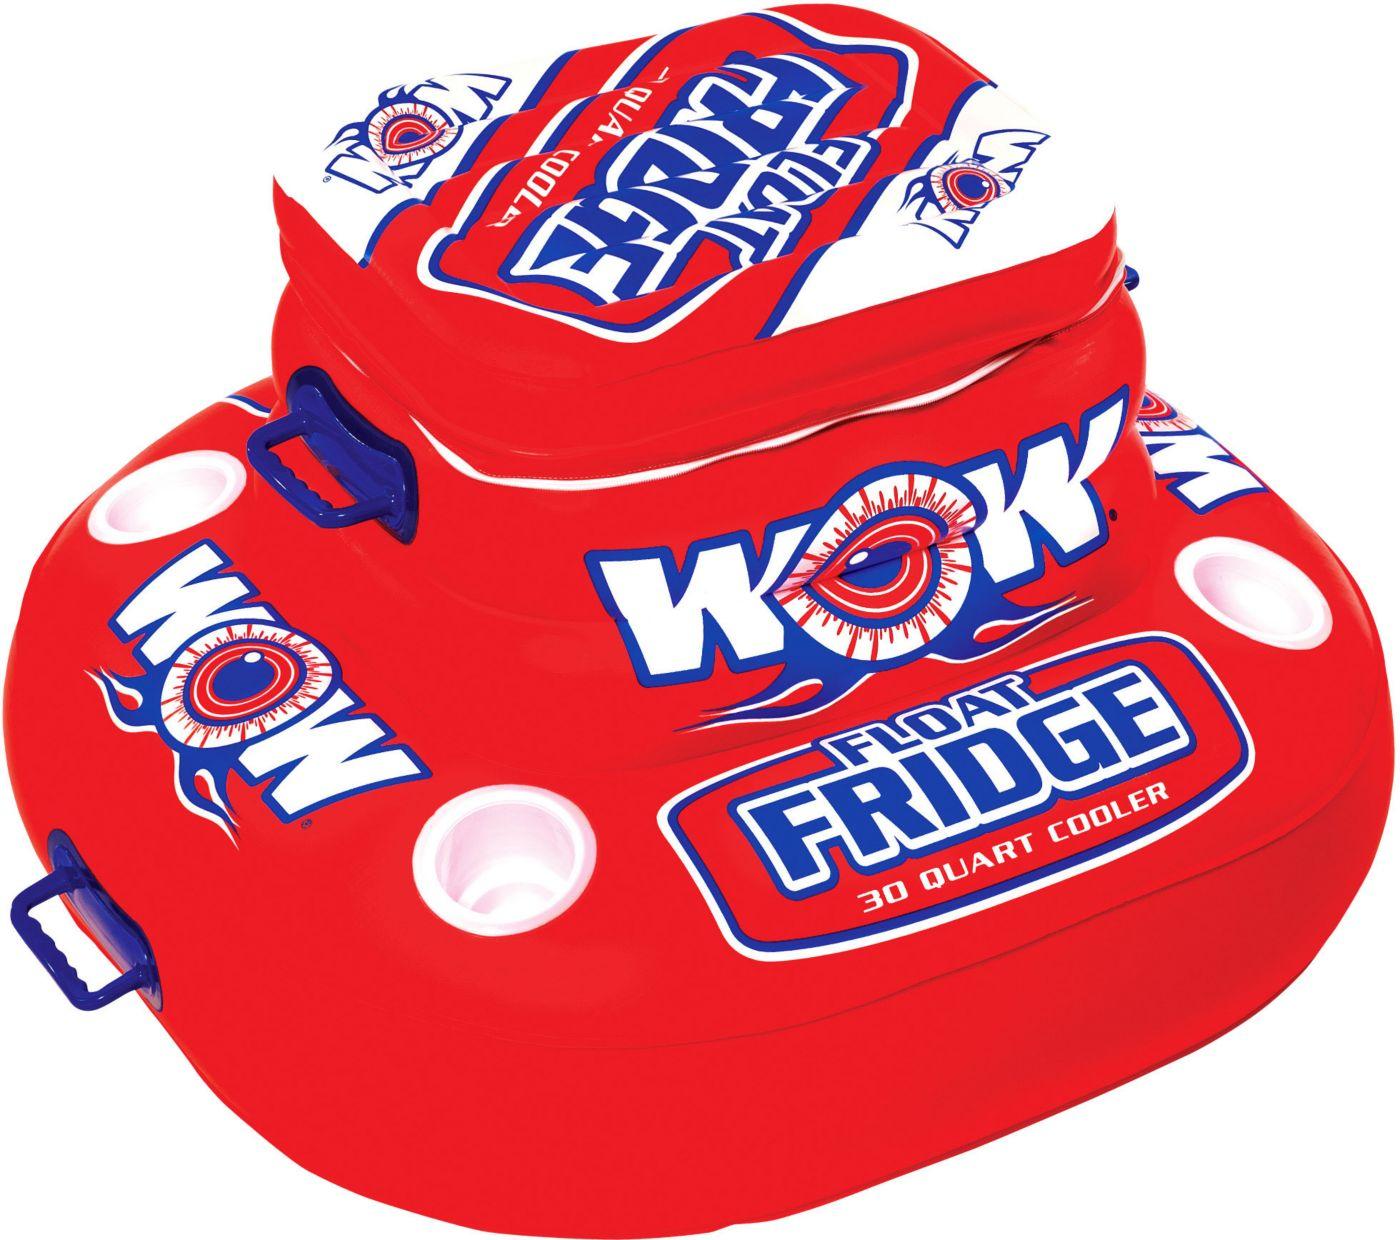 WOW Floating Fridge Cooler